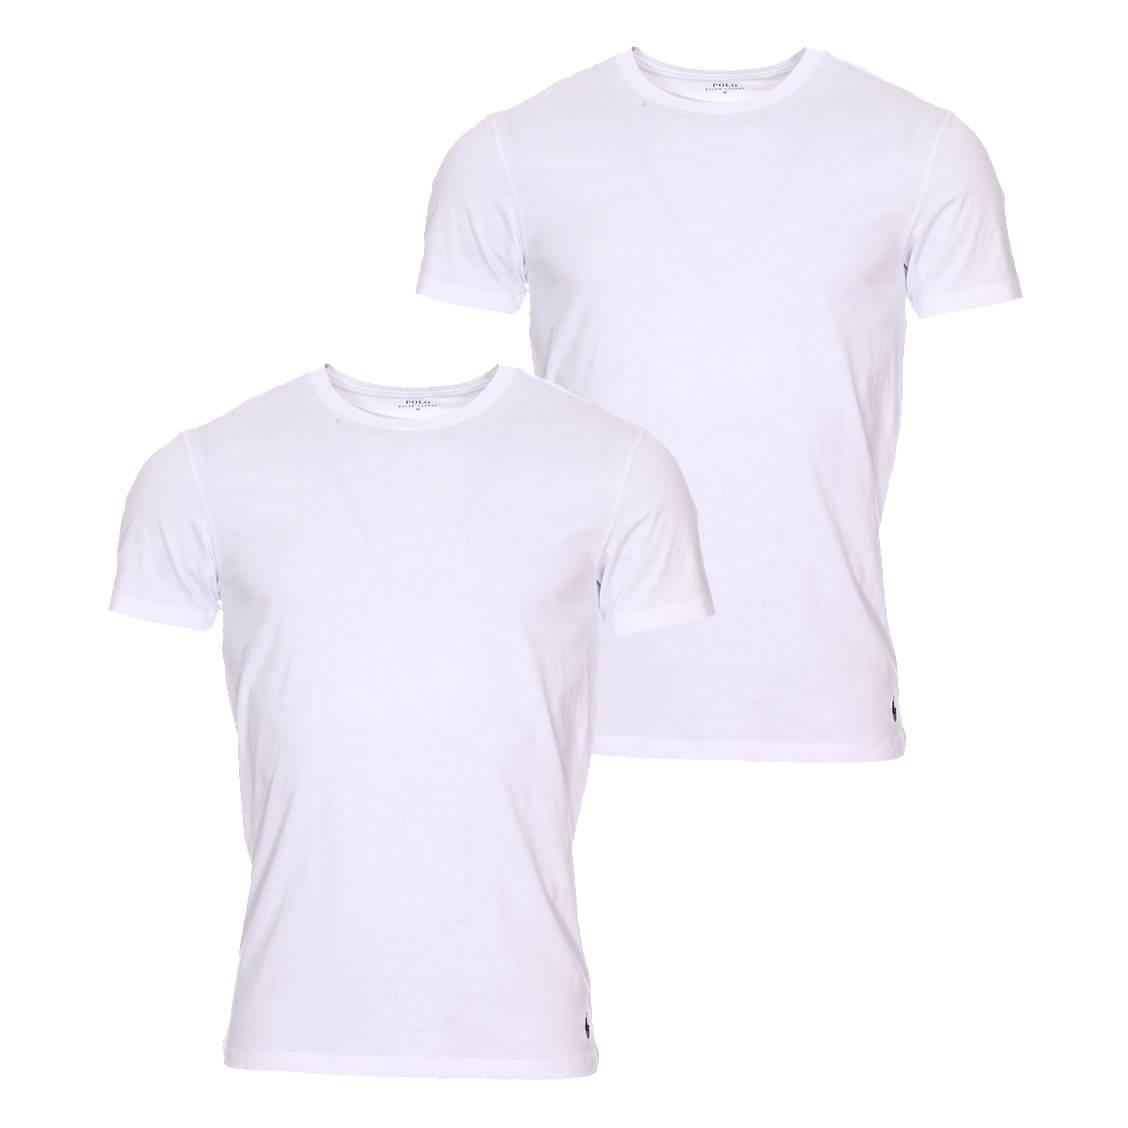 Lot de 2 tee-shirts col rond  en coton blanc à logo bleu marine brodé